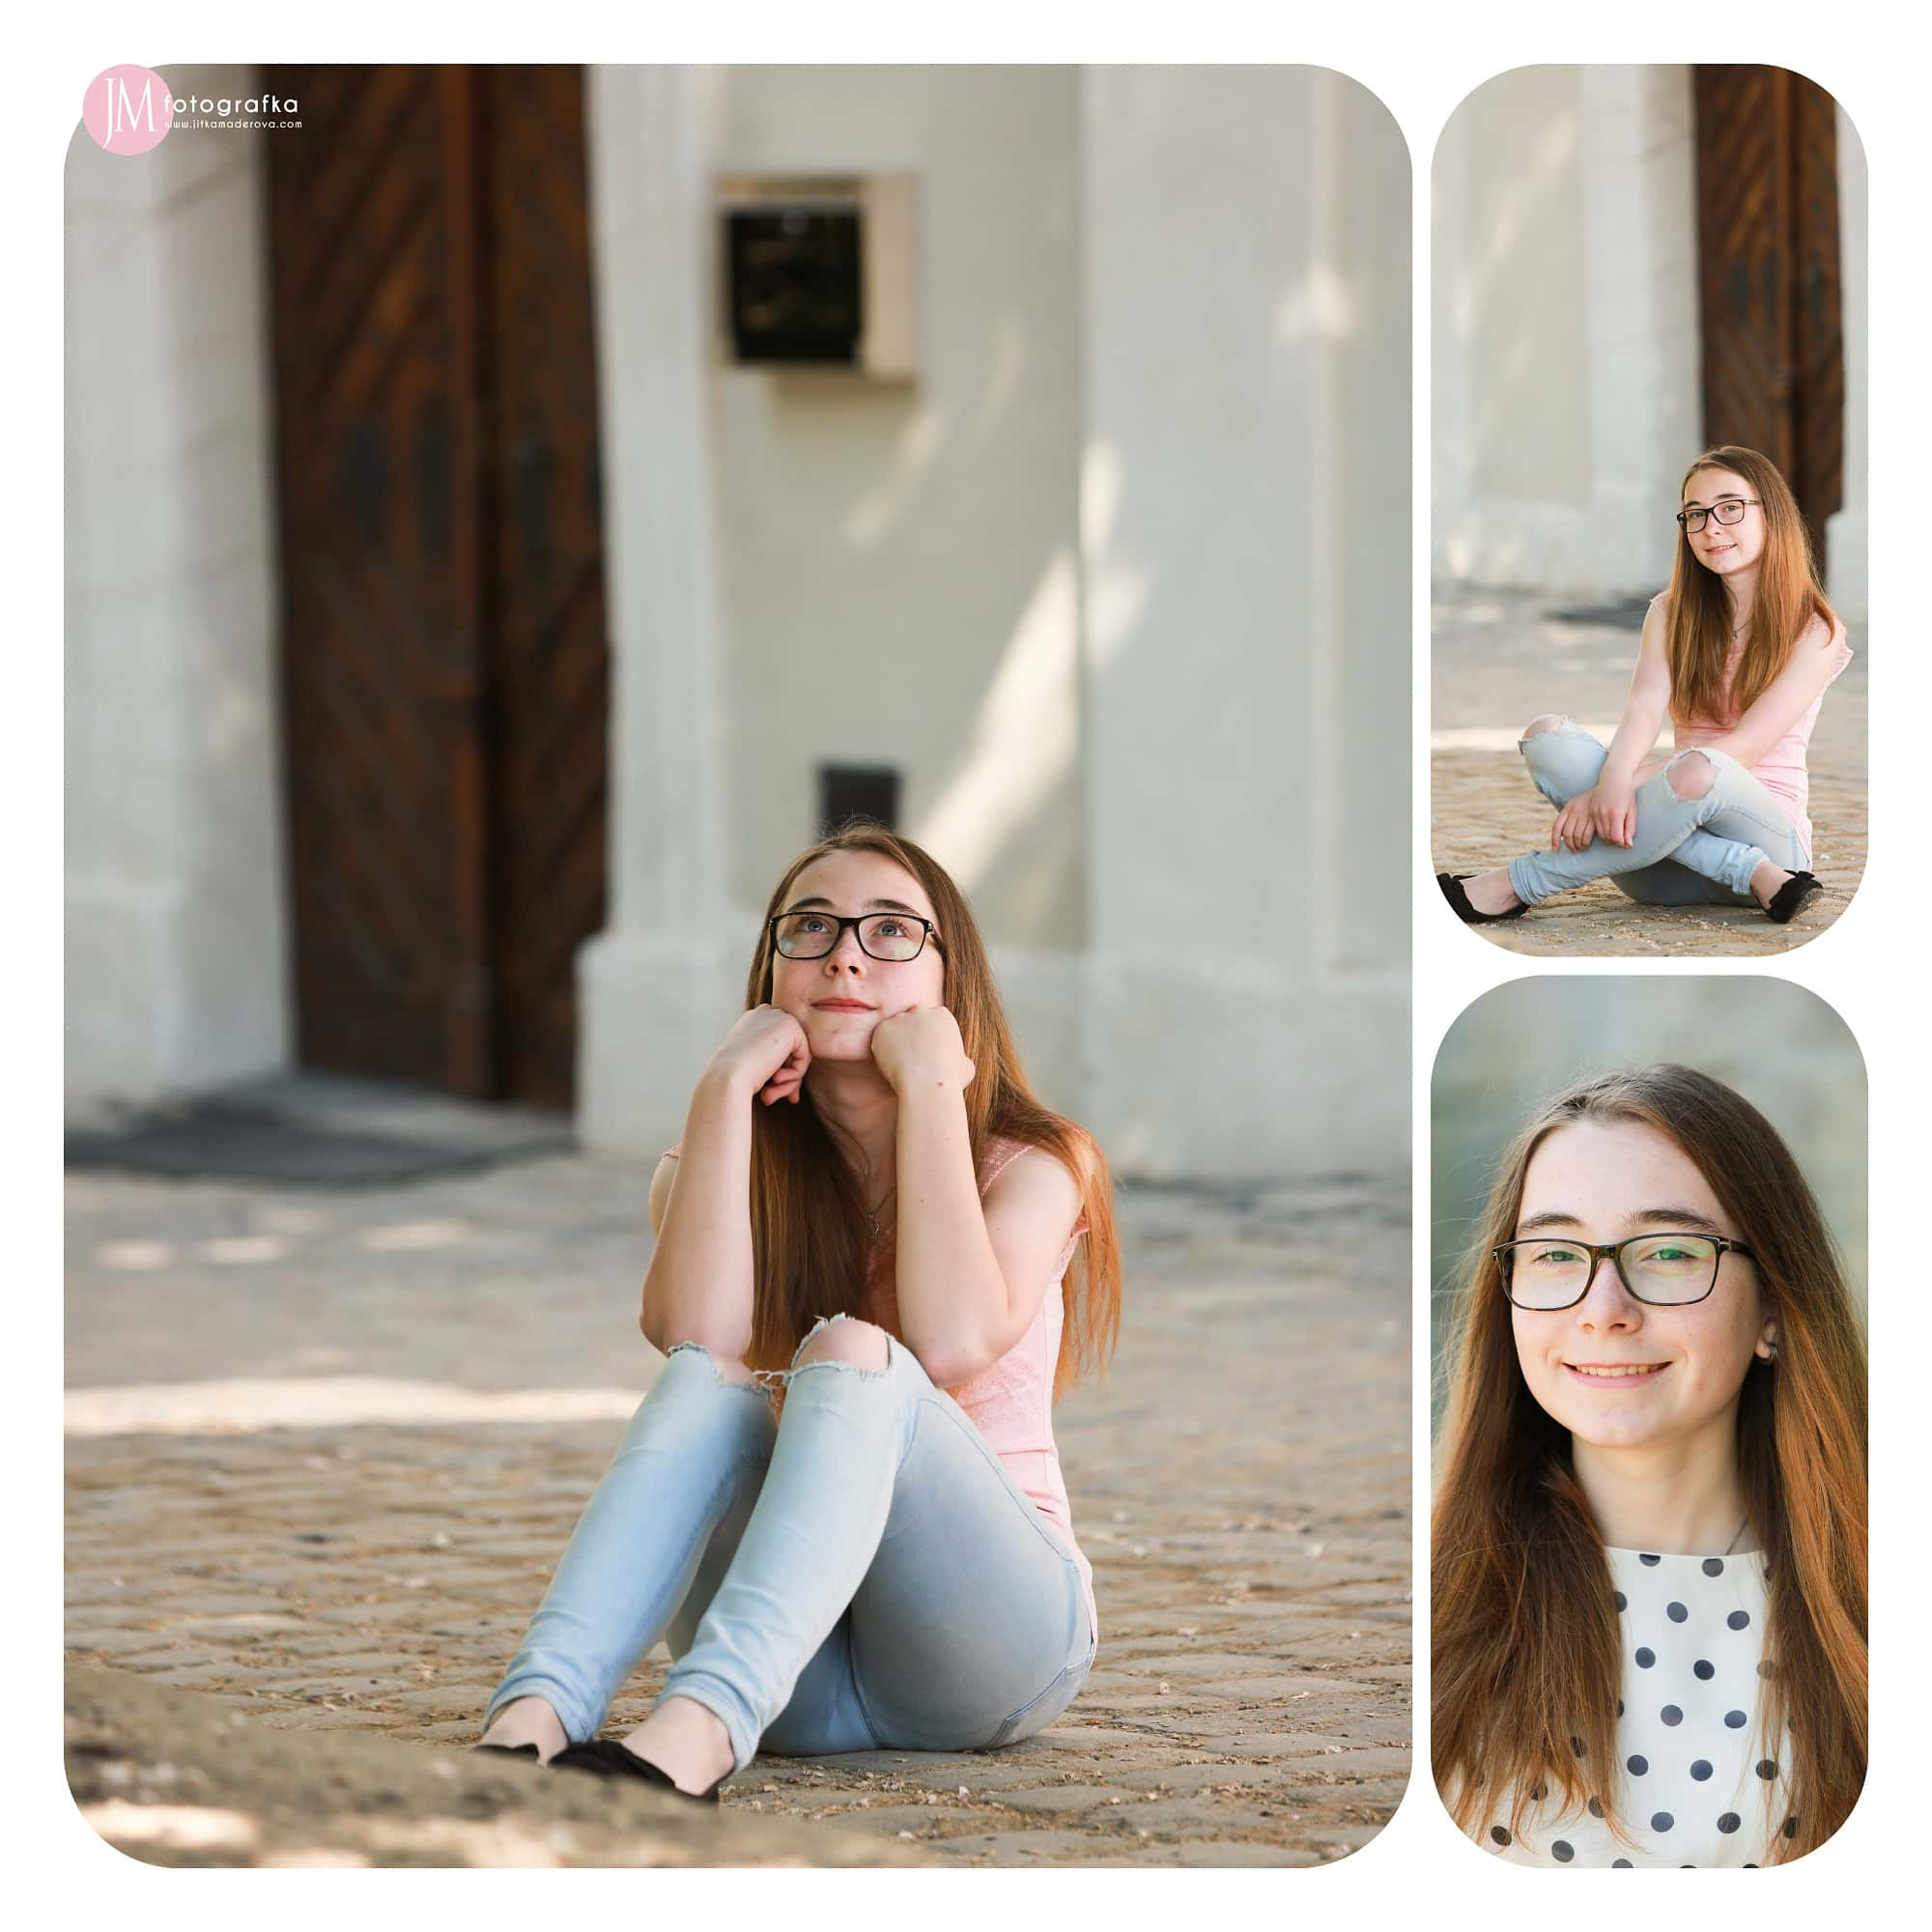 jitka-maderova-fotografka-portrety-002